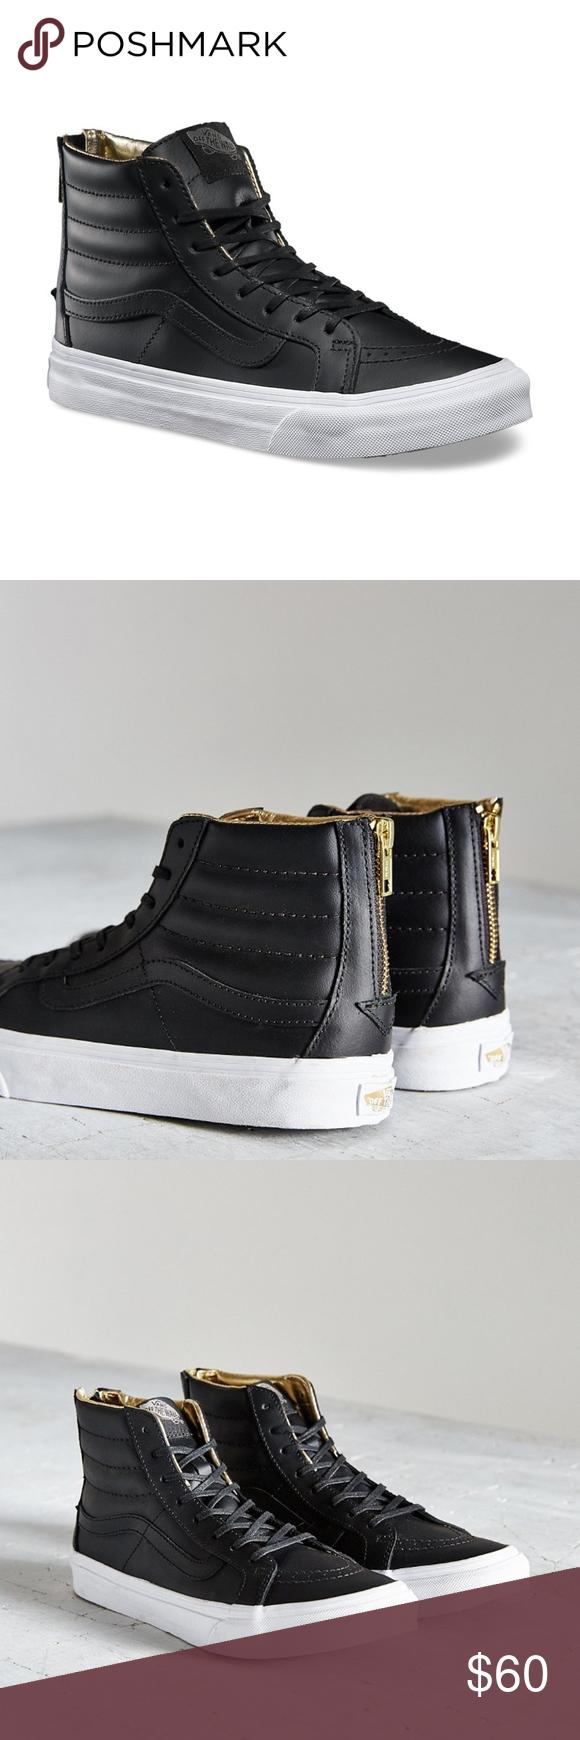 60e75369f6 Women Black Leather Sk8-hi Slim Zip Sneaker Size 6 The Vans Sk8-Hi ...